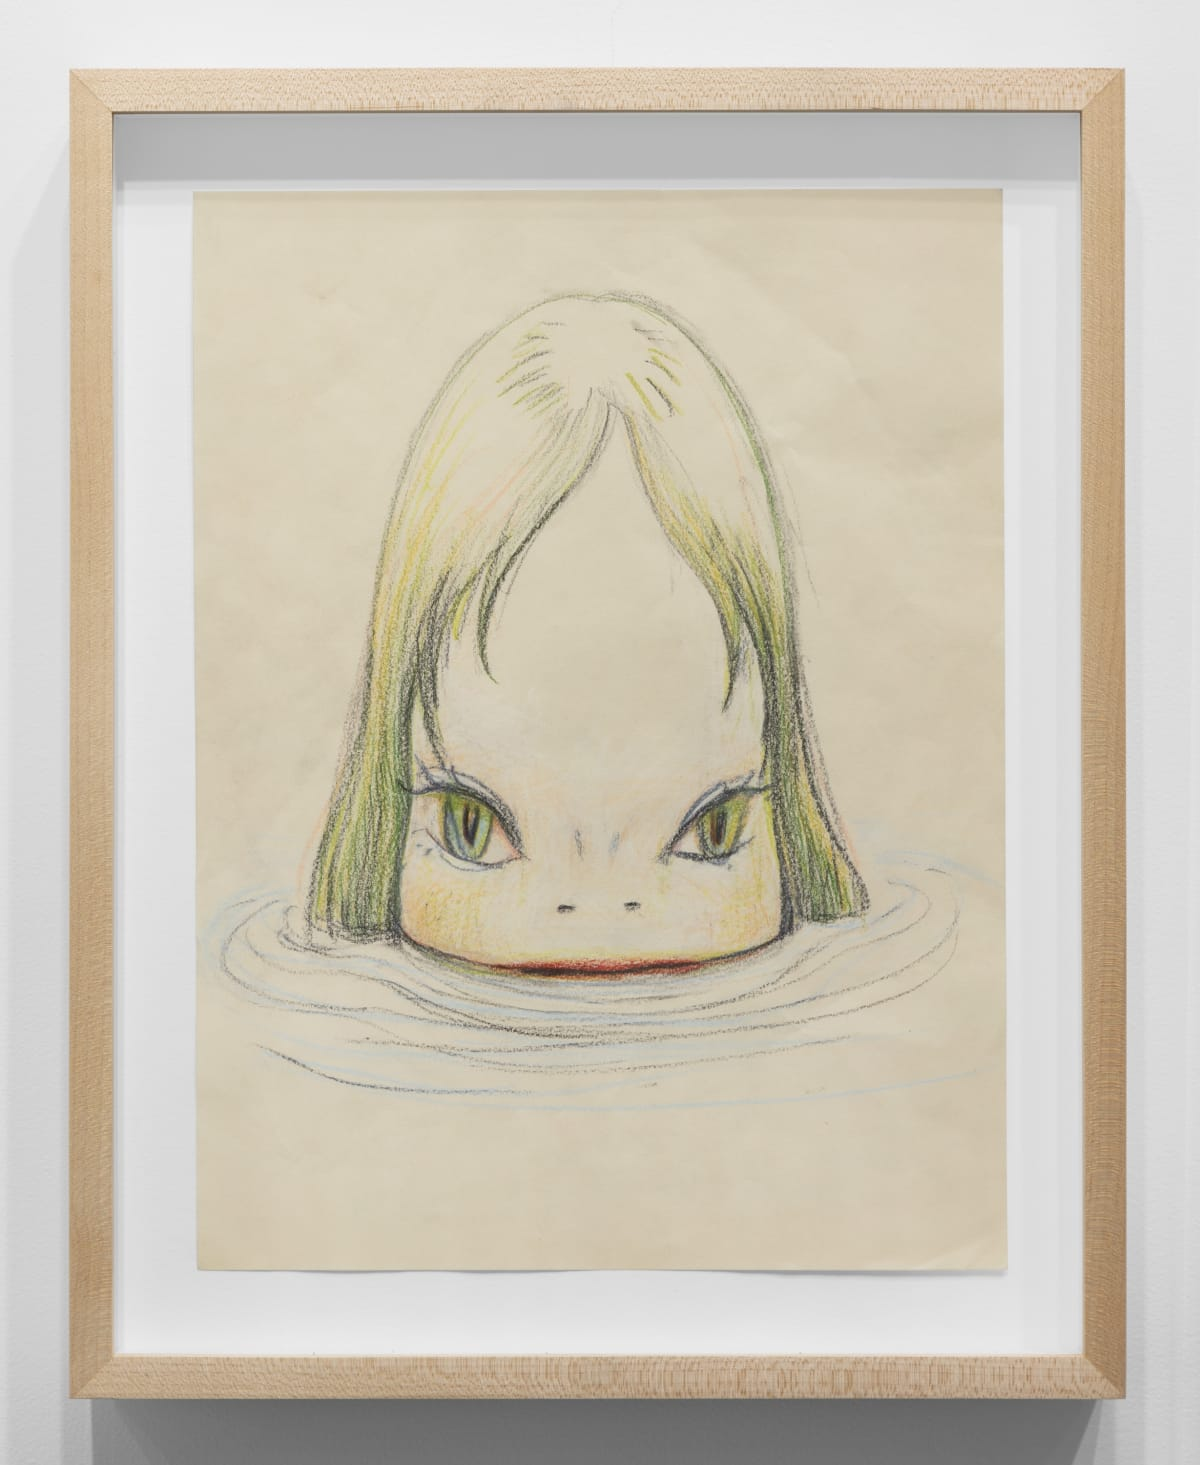 Yoshitomo Nara Untitled, 2006 Color pencil on paper 12 1/2 x 9 1/2 in (31.8 x 24.1 cm) © YOSHITOMO NARA